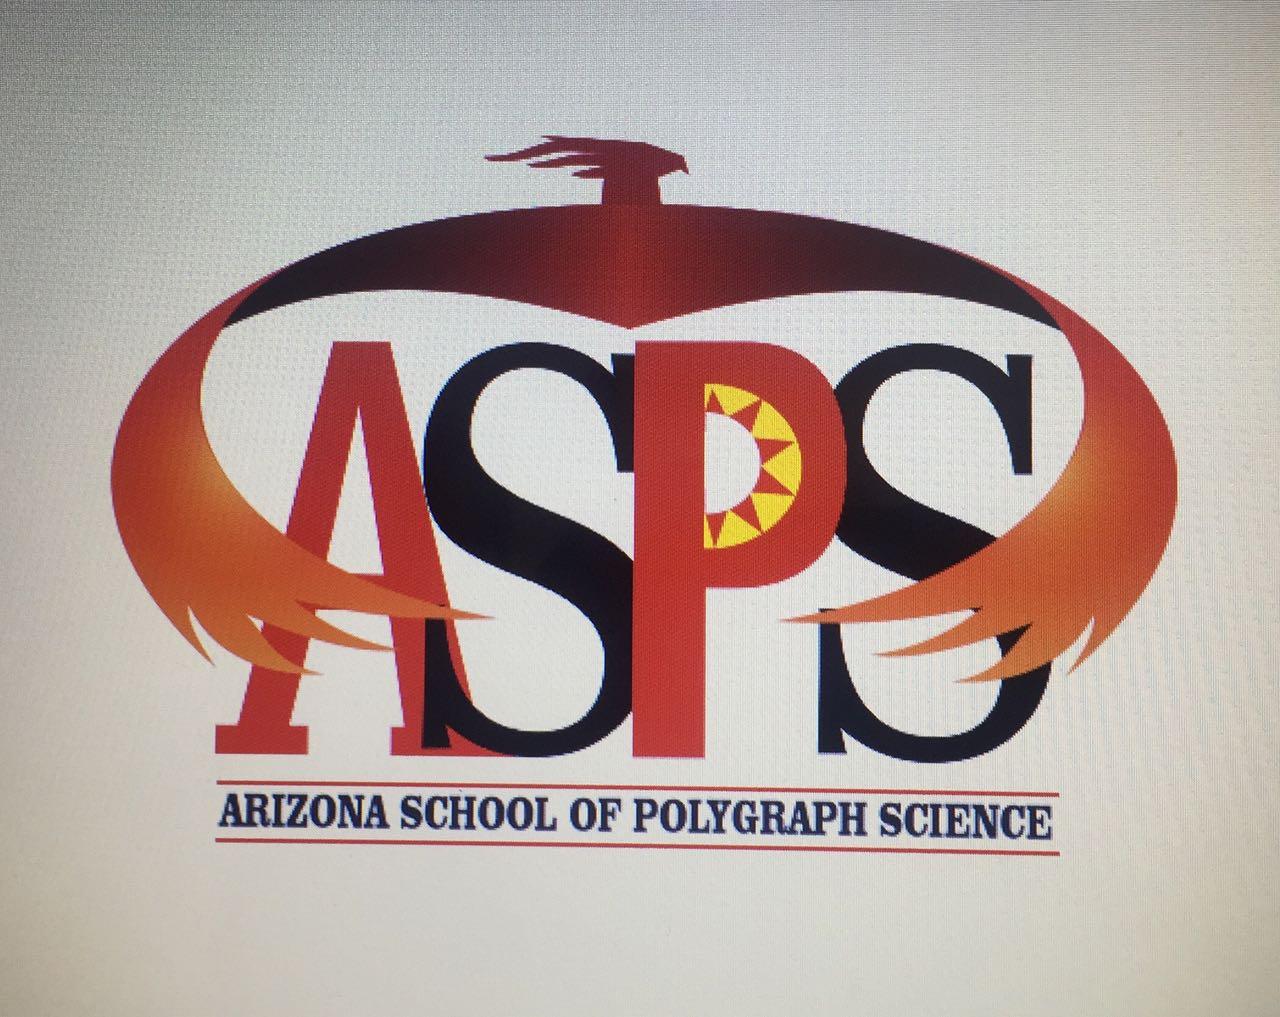 https://www.arizonaschoolofpolygraphscience.com/